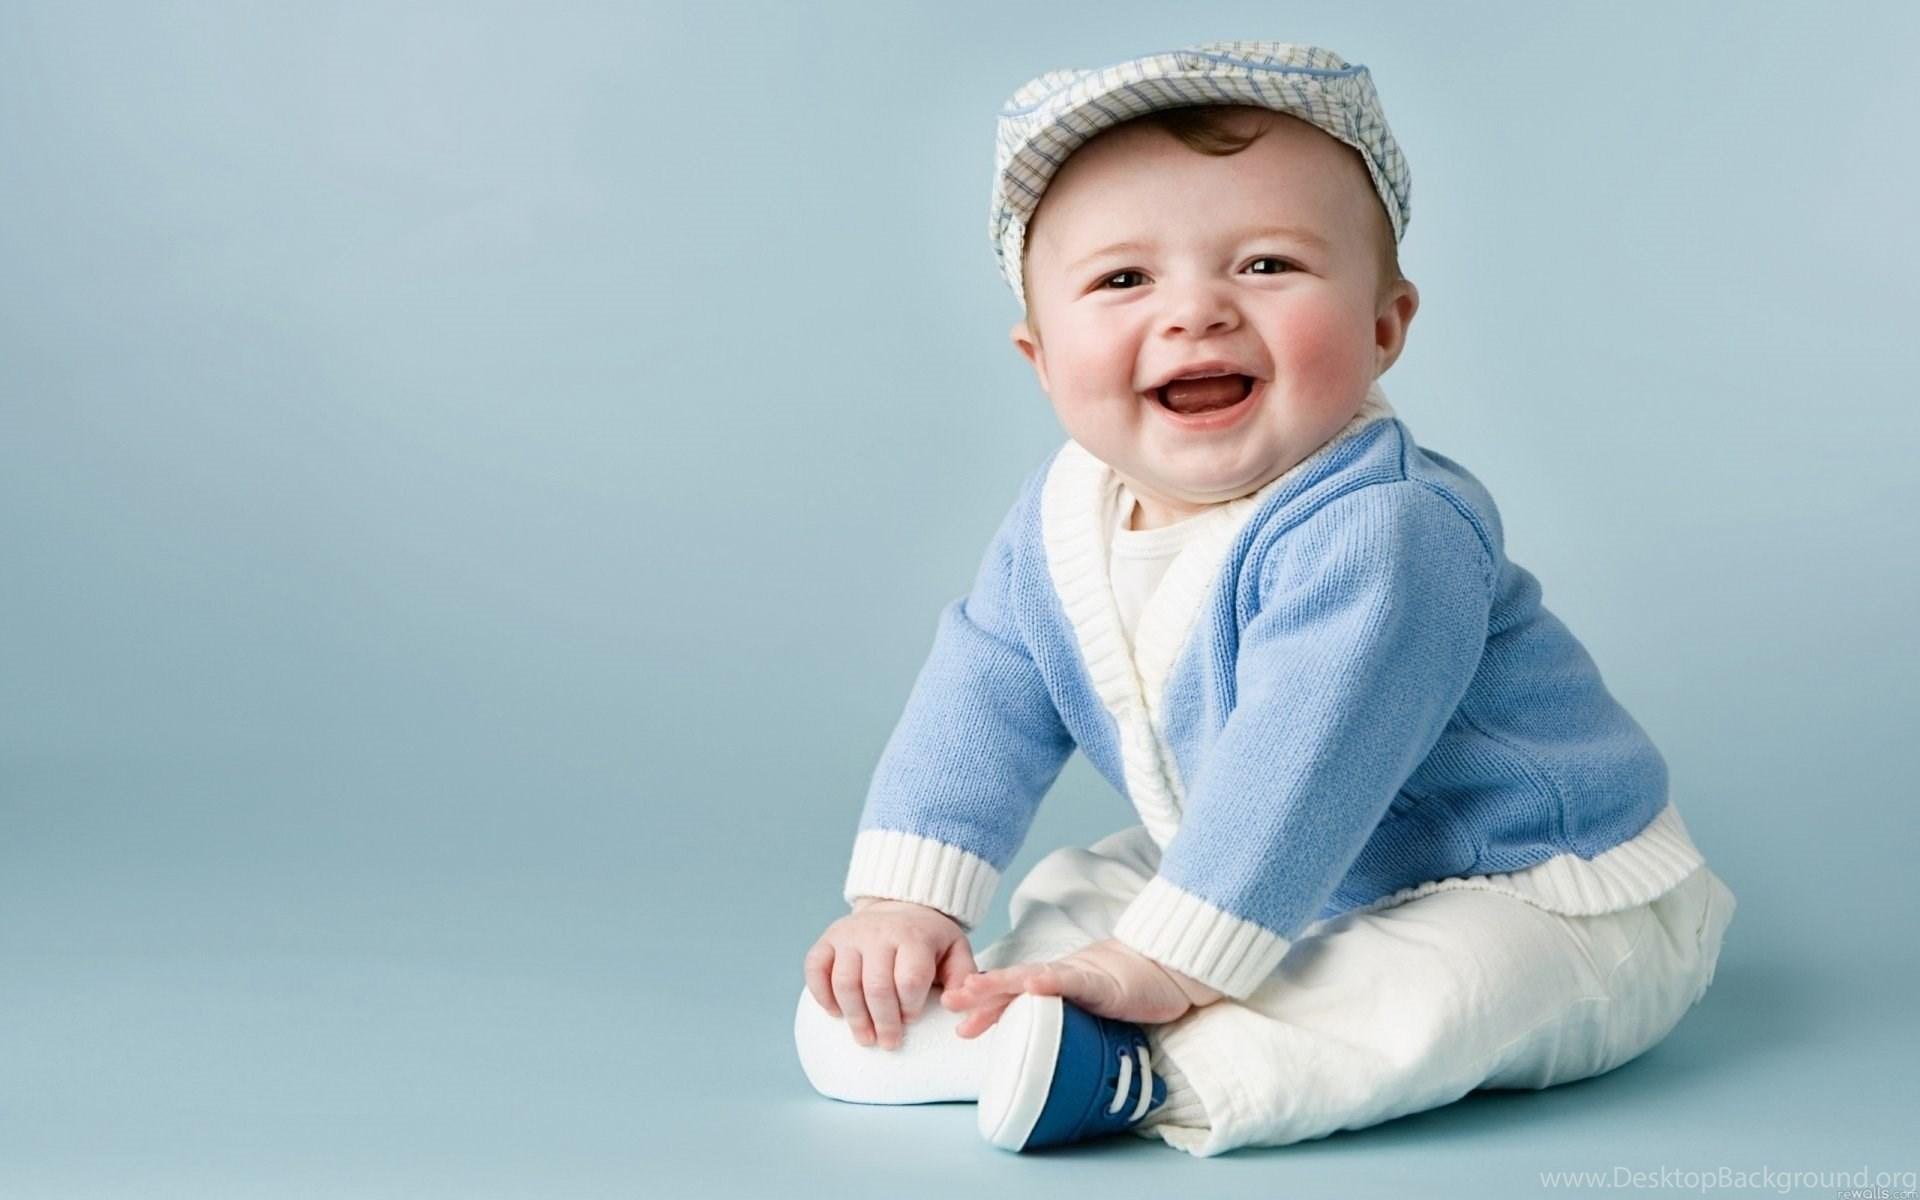 Smiling Baby Boy Cute Wallpapers Hd Free Download Desktop Background